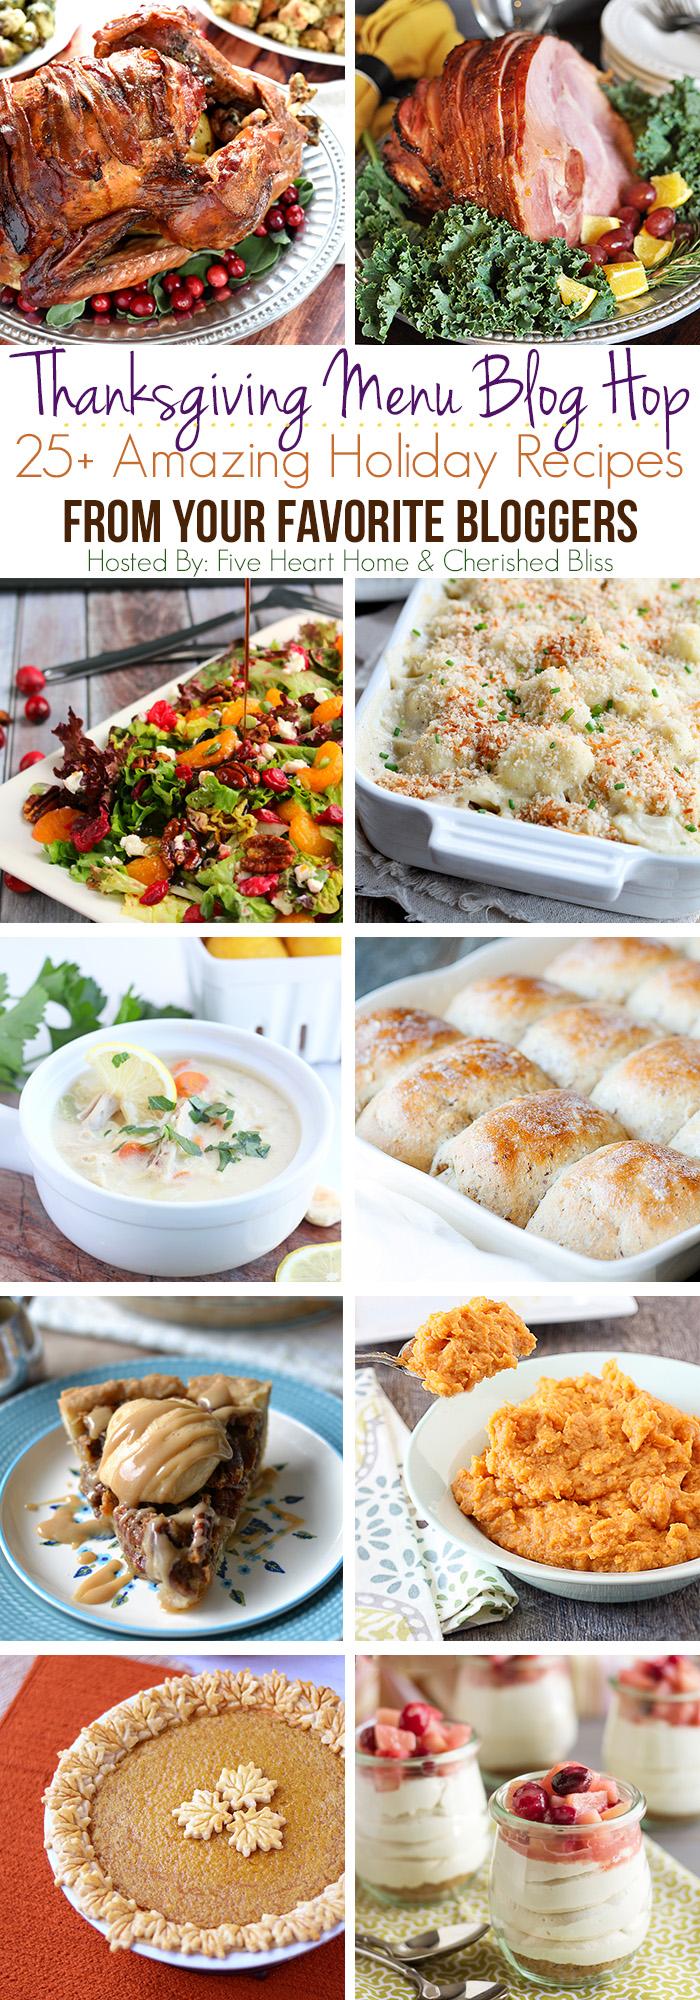 Thanksgiving Recipe Blog Hop